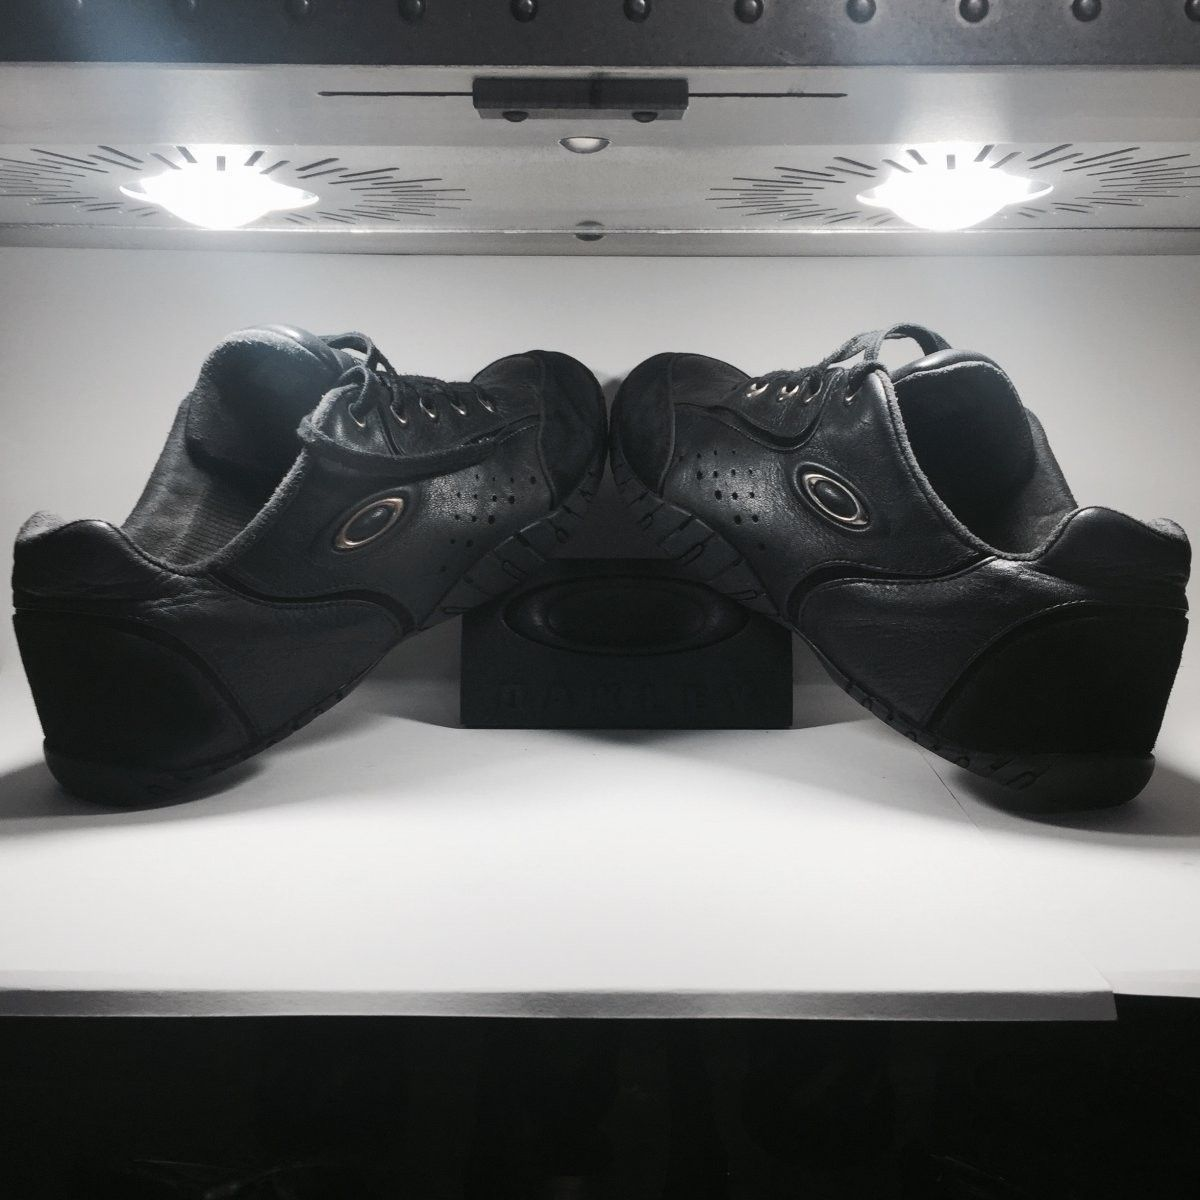 Oakley Shoes Size 12.5 Original Rip Cords Black/Chrome - Oakley Rip Cord Black Chrome (3).jpg